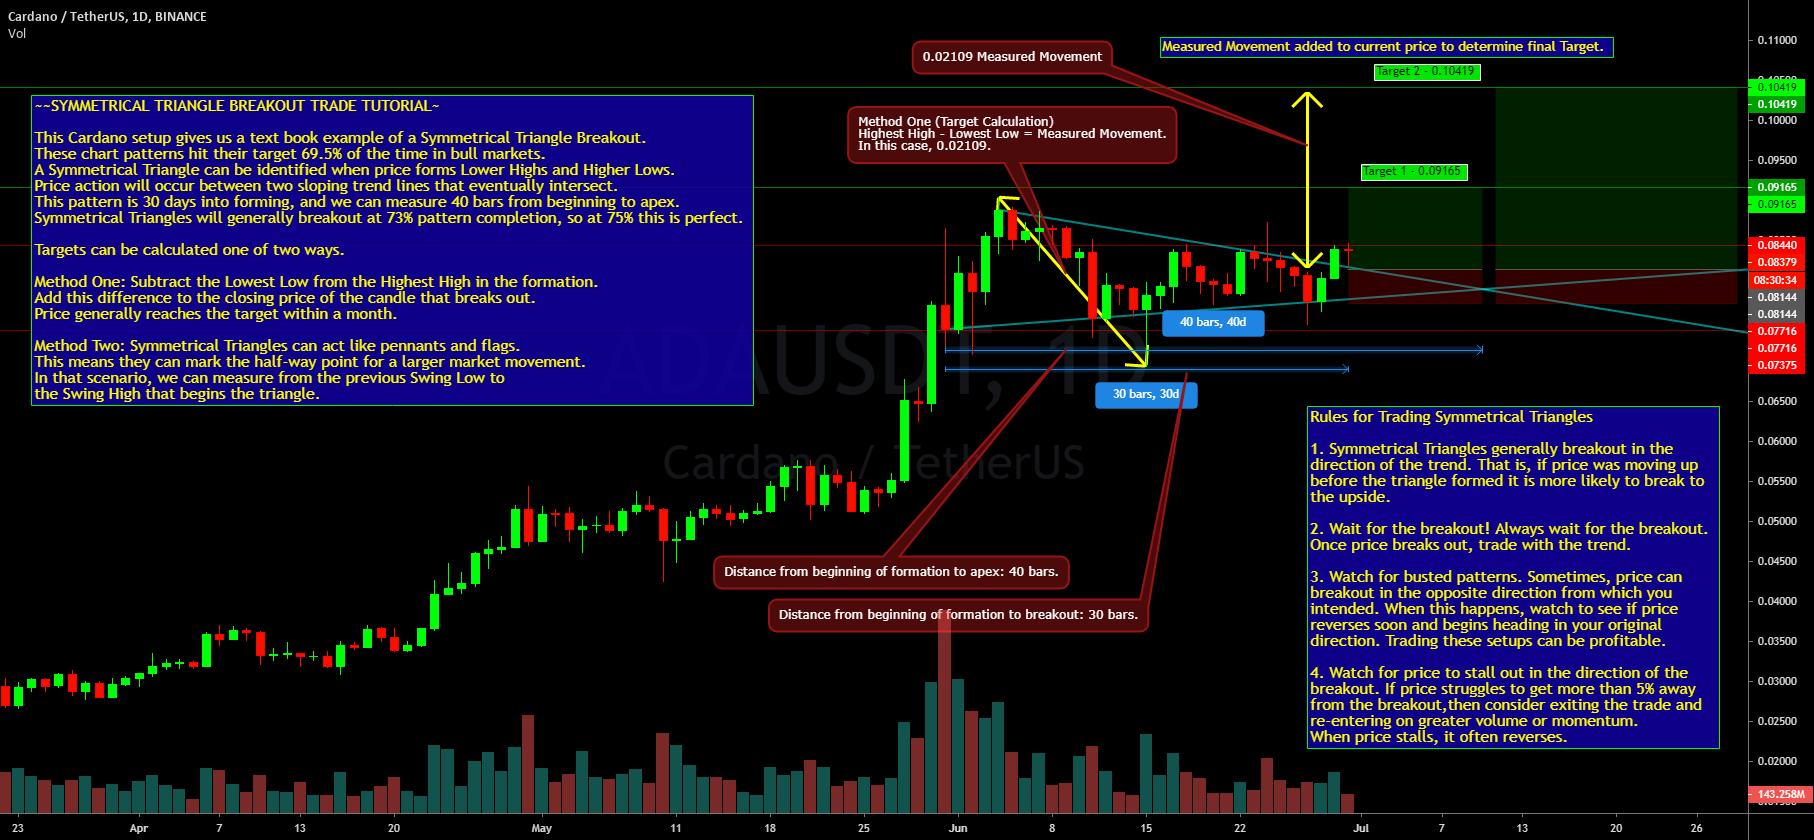 ADA USDT - Symmetrical Triangle Breakout (Tutorial and ...